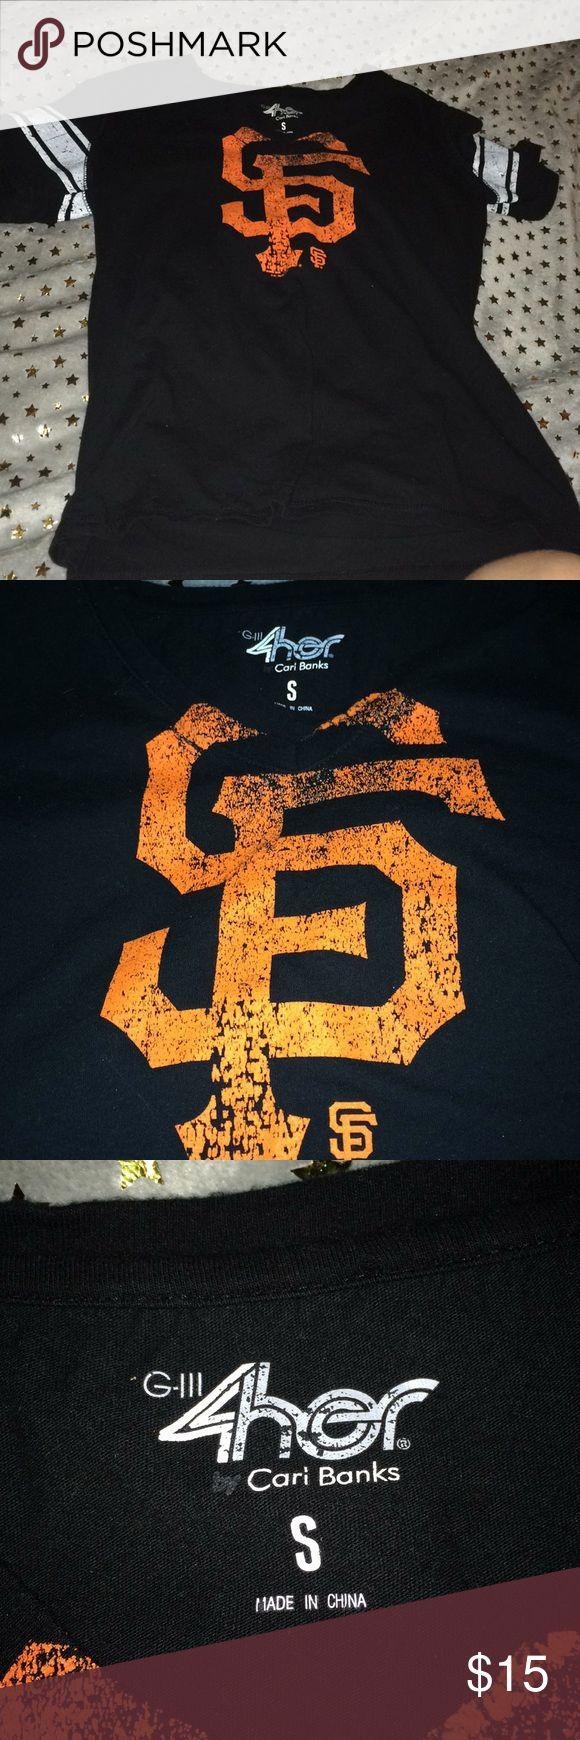 San Francisco giants shirt Sf giants shirt hardly worn Tops Tees - Short Sleeve